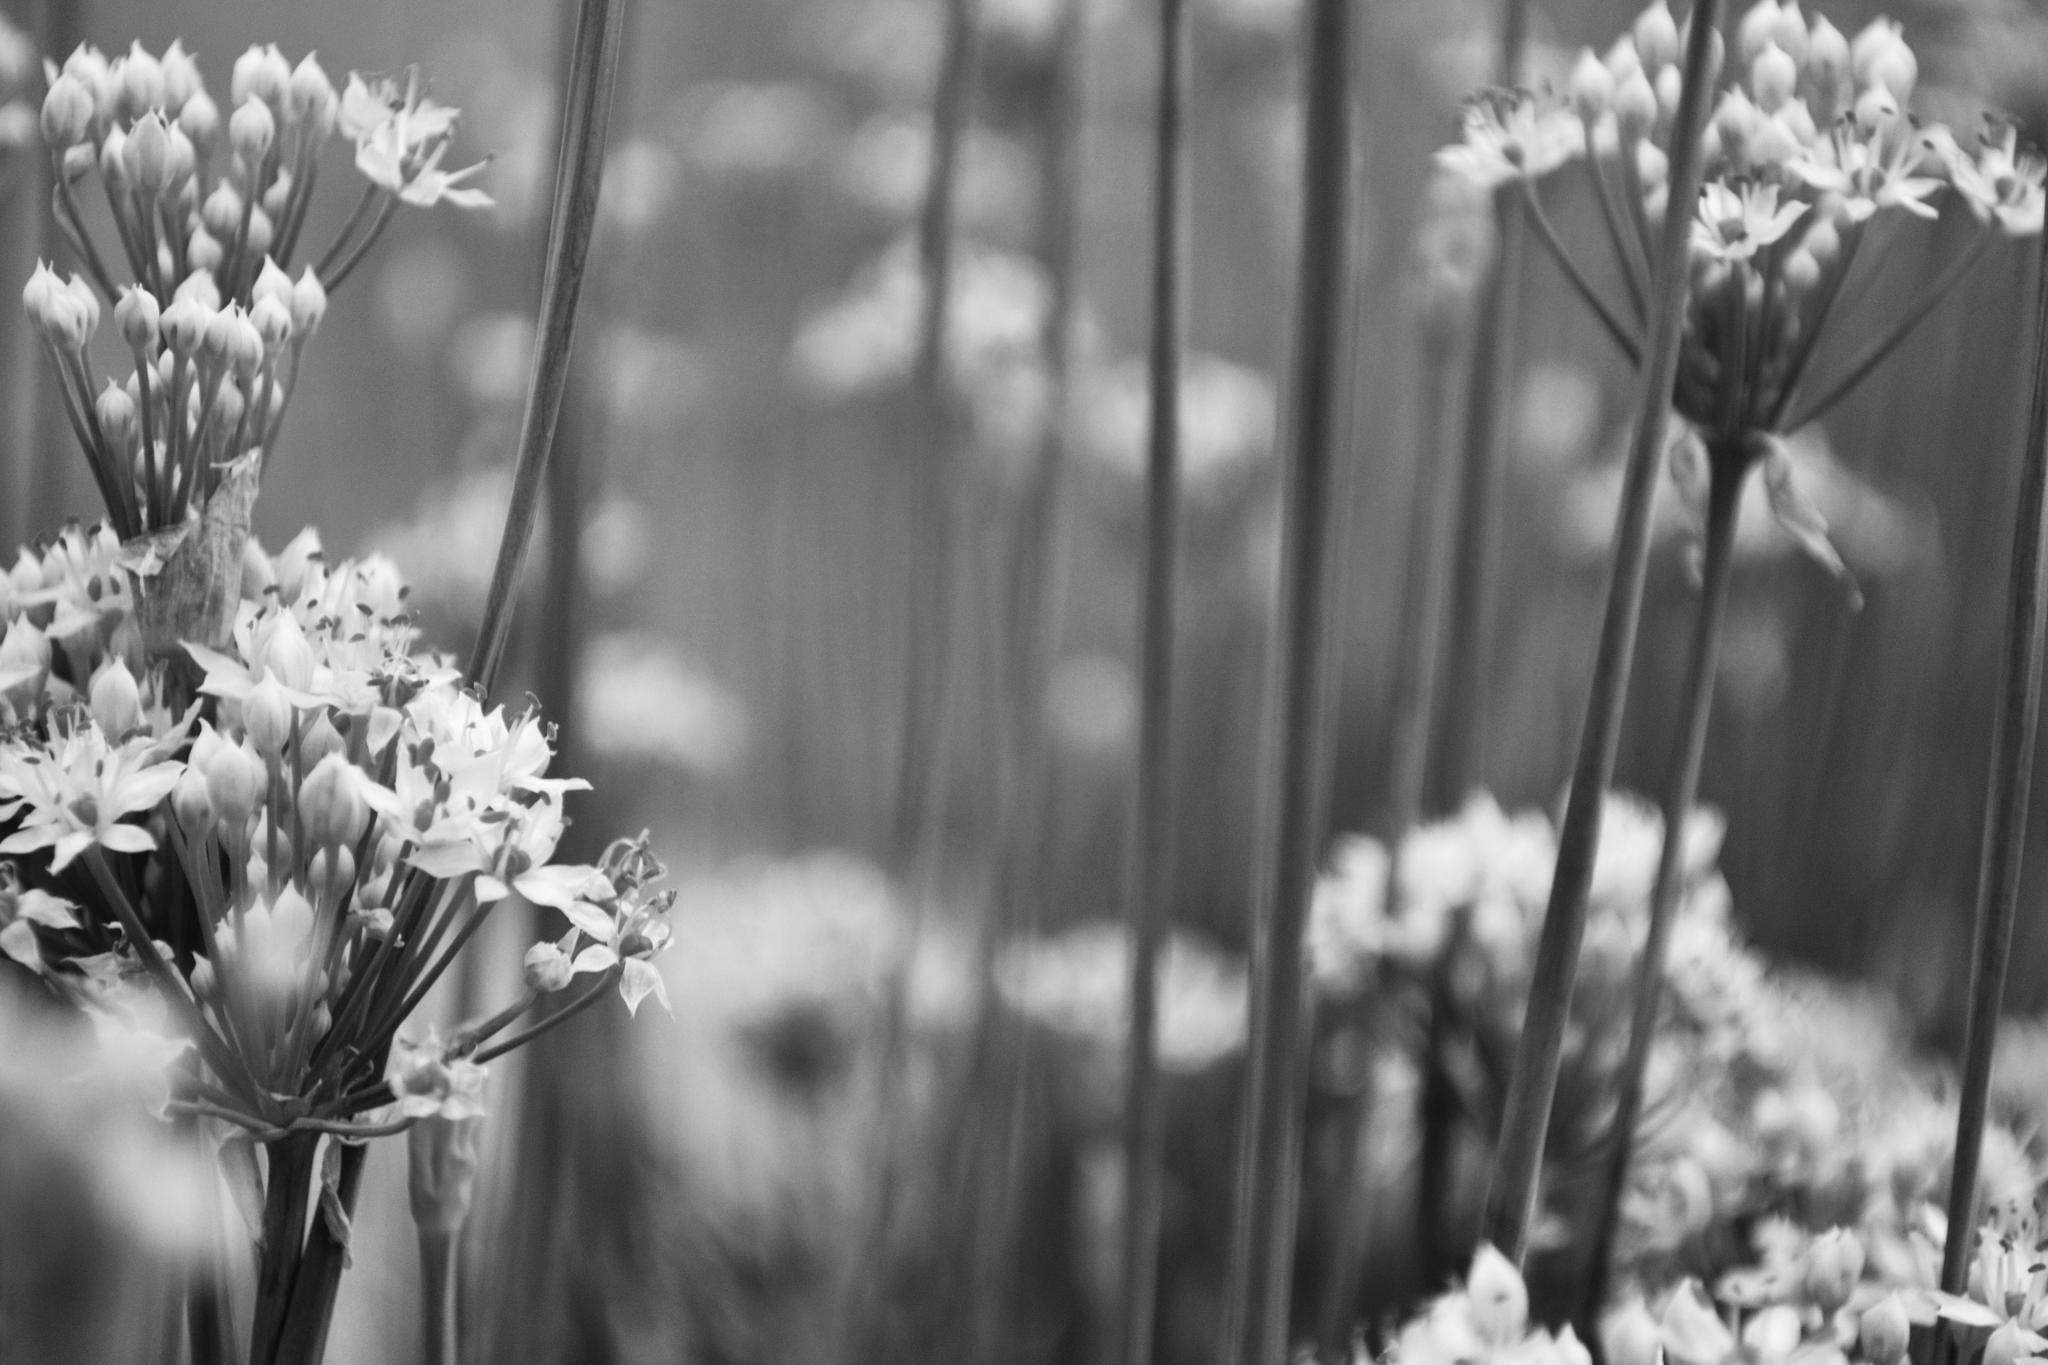 Life in Black and White by Linda Masanimptewa